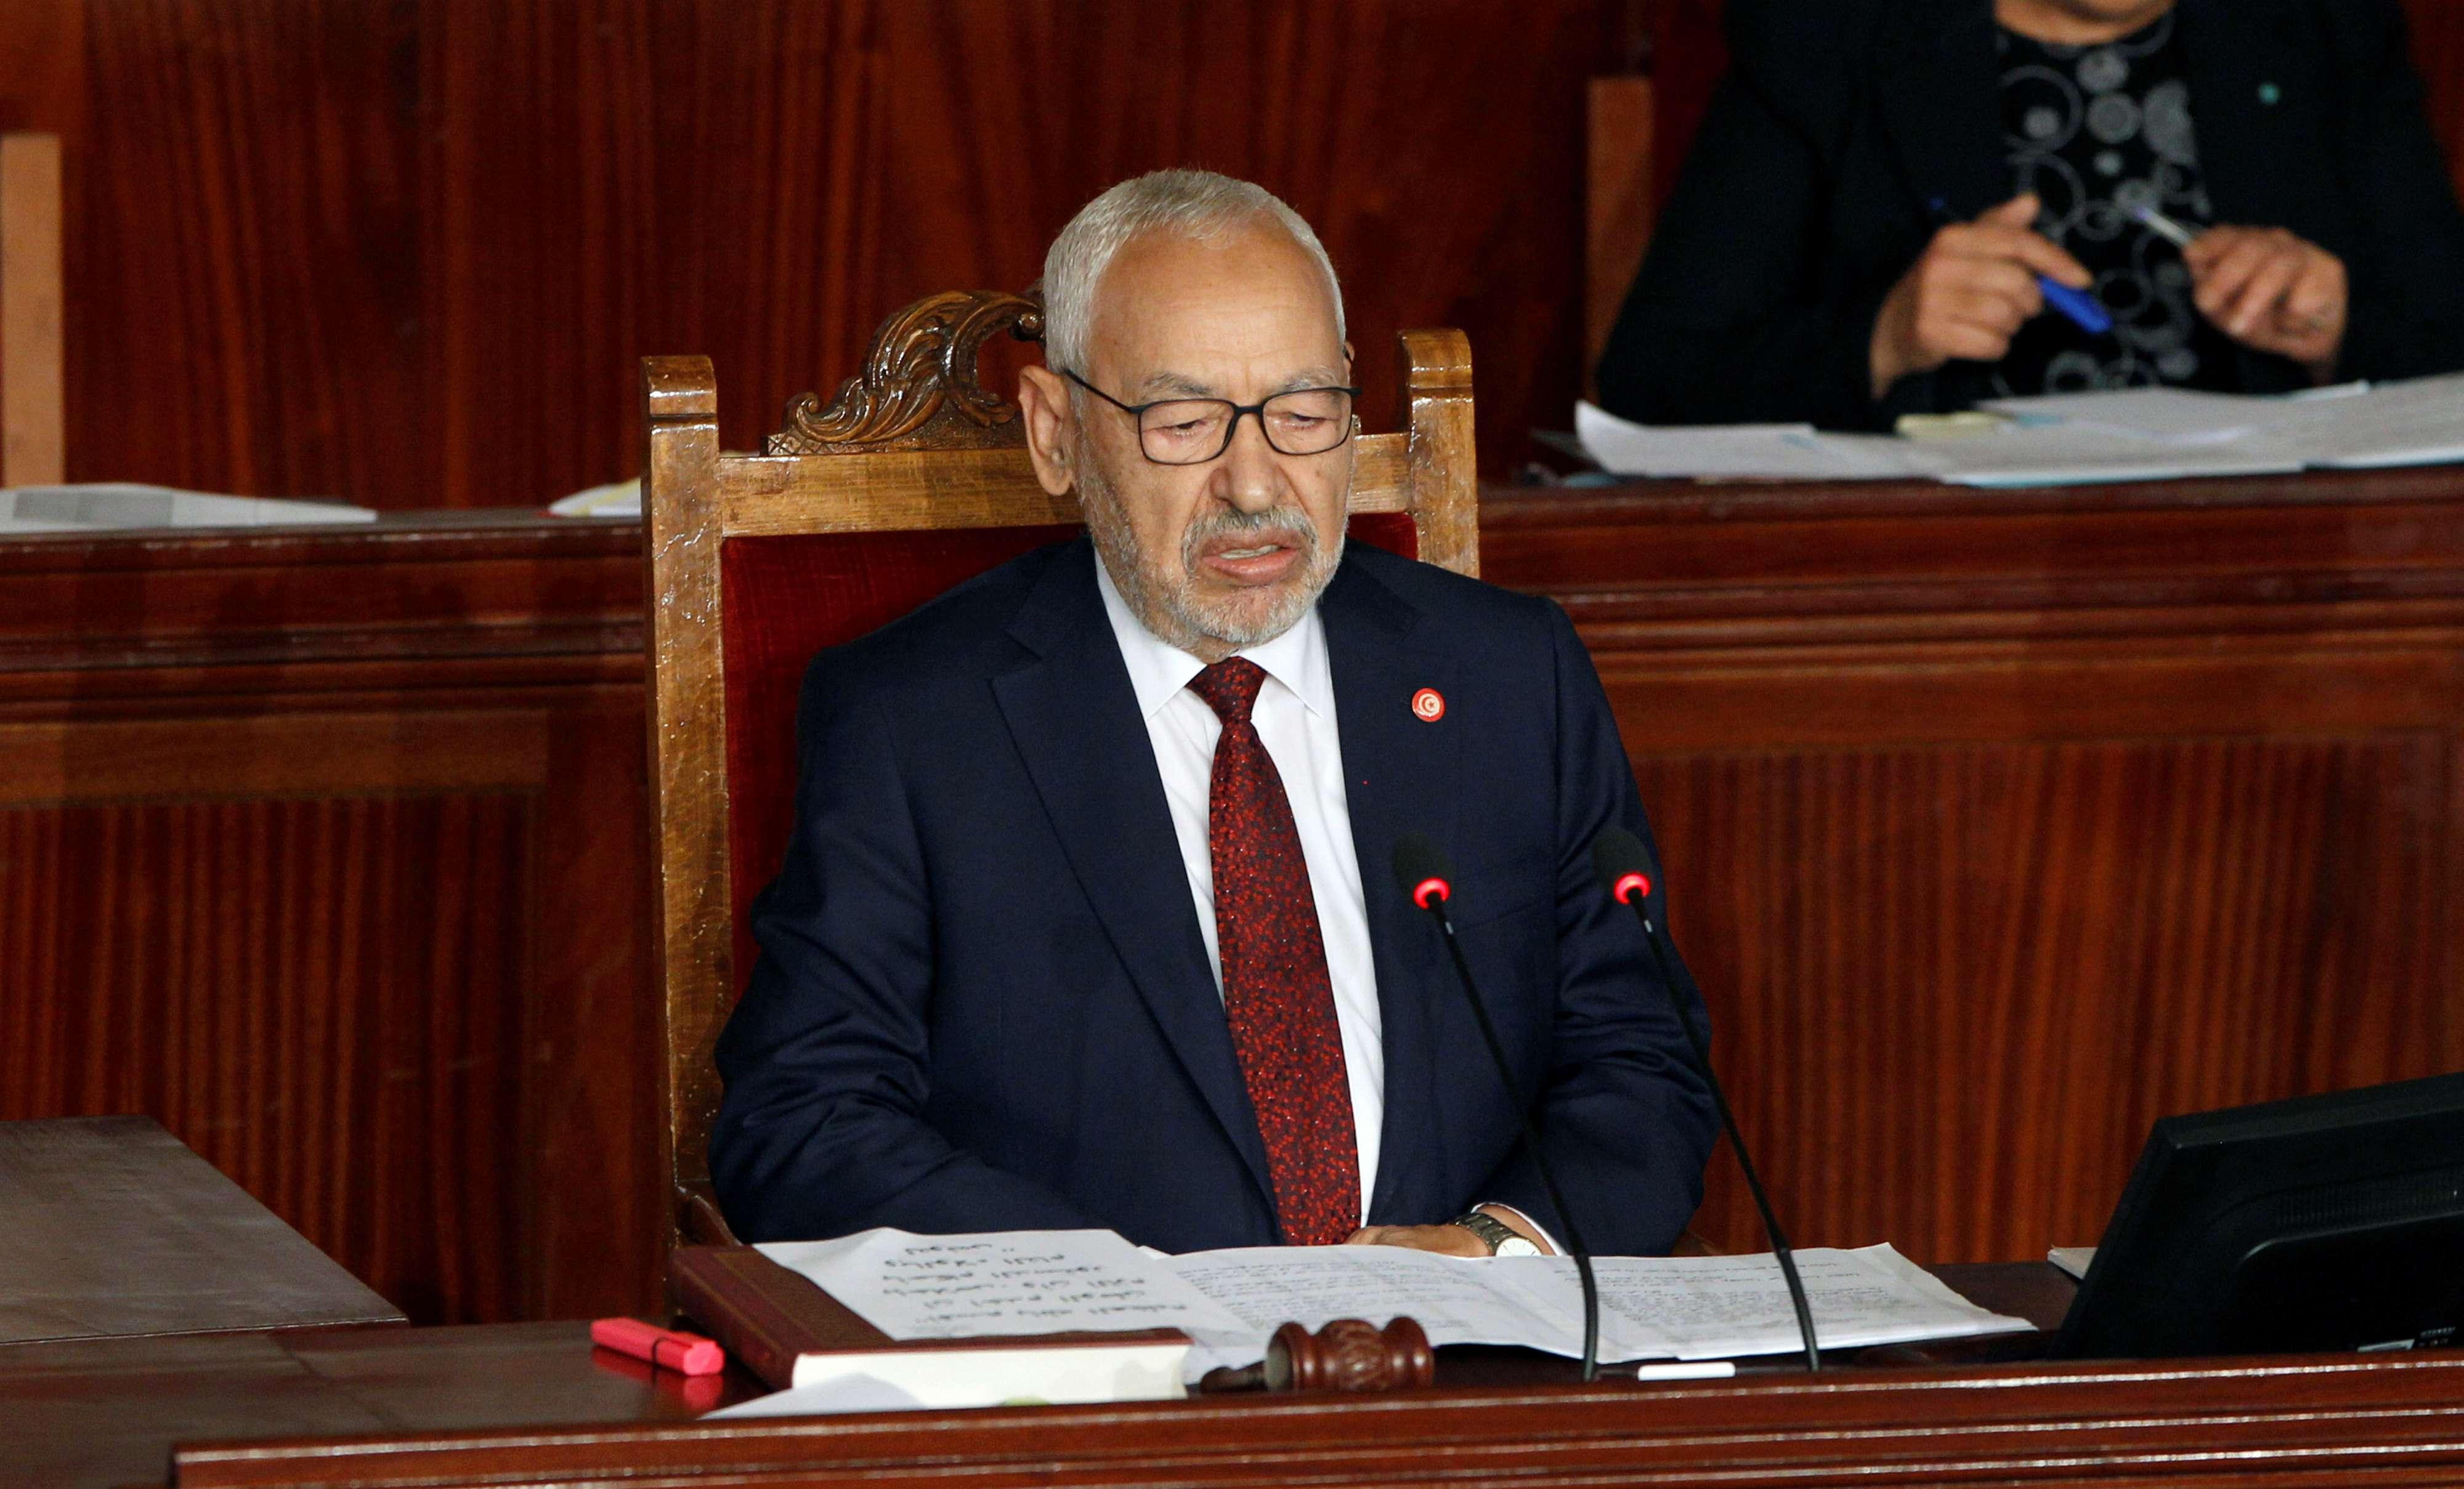 20191113164546reup--2019-11-13t164324z_176163216_rc2gad9ine8q_rtrmadp_3_tunisia-politics-parliament.h